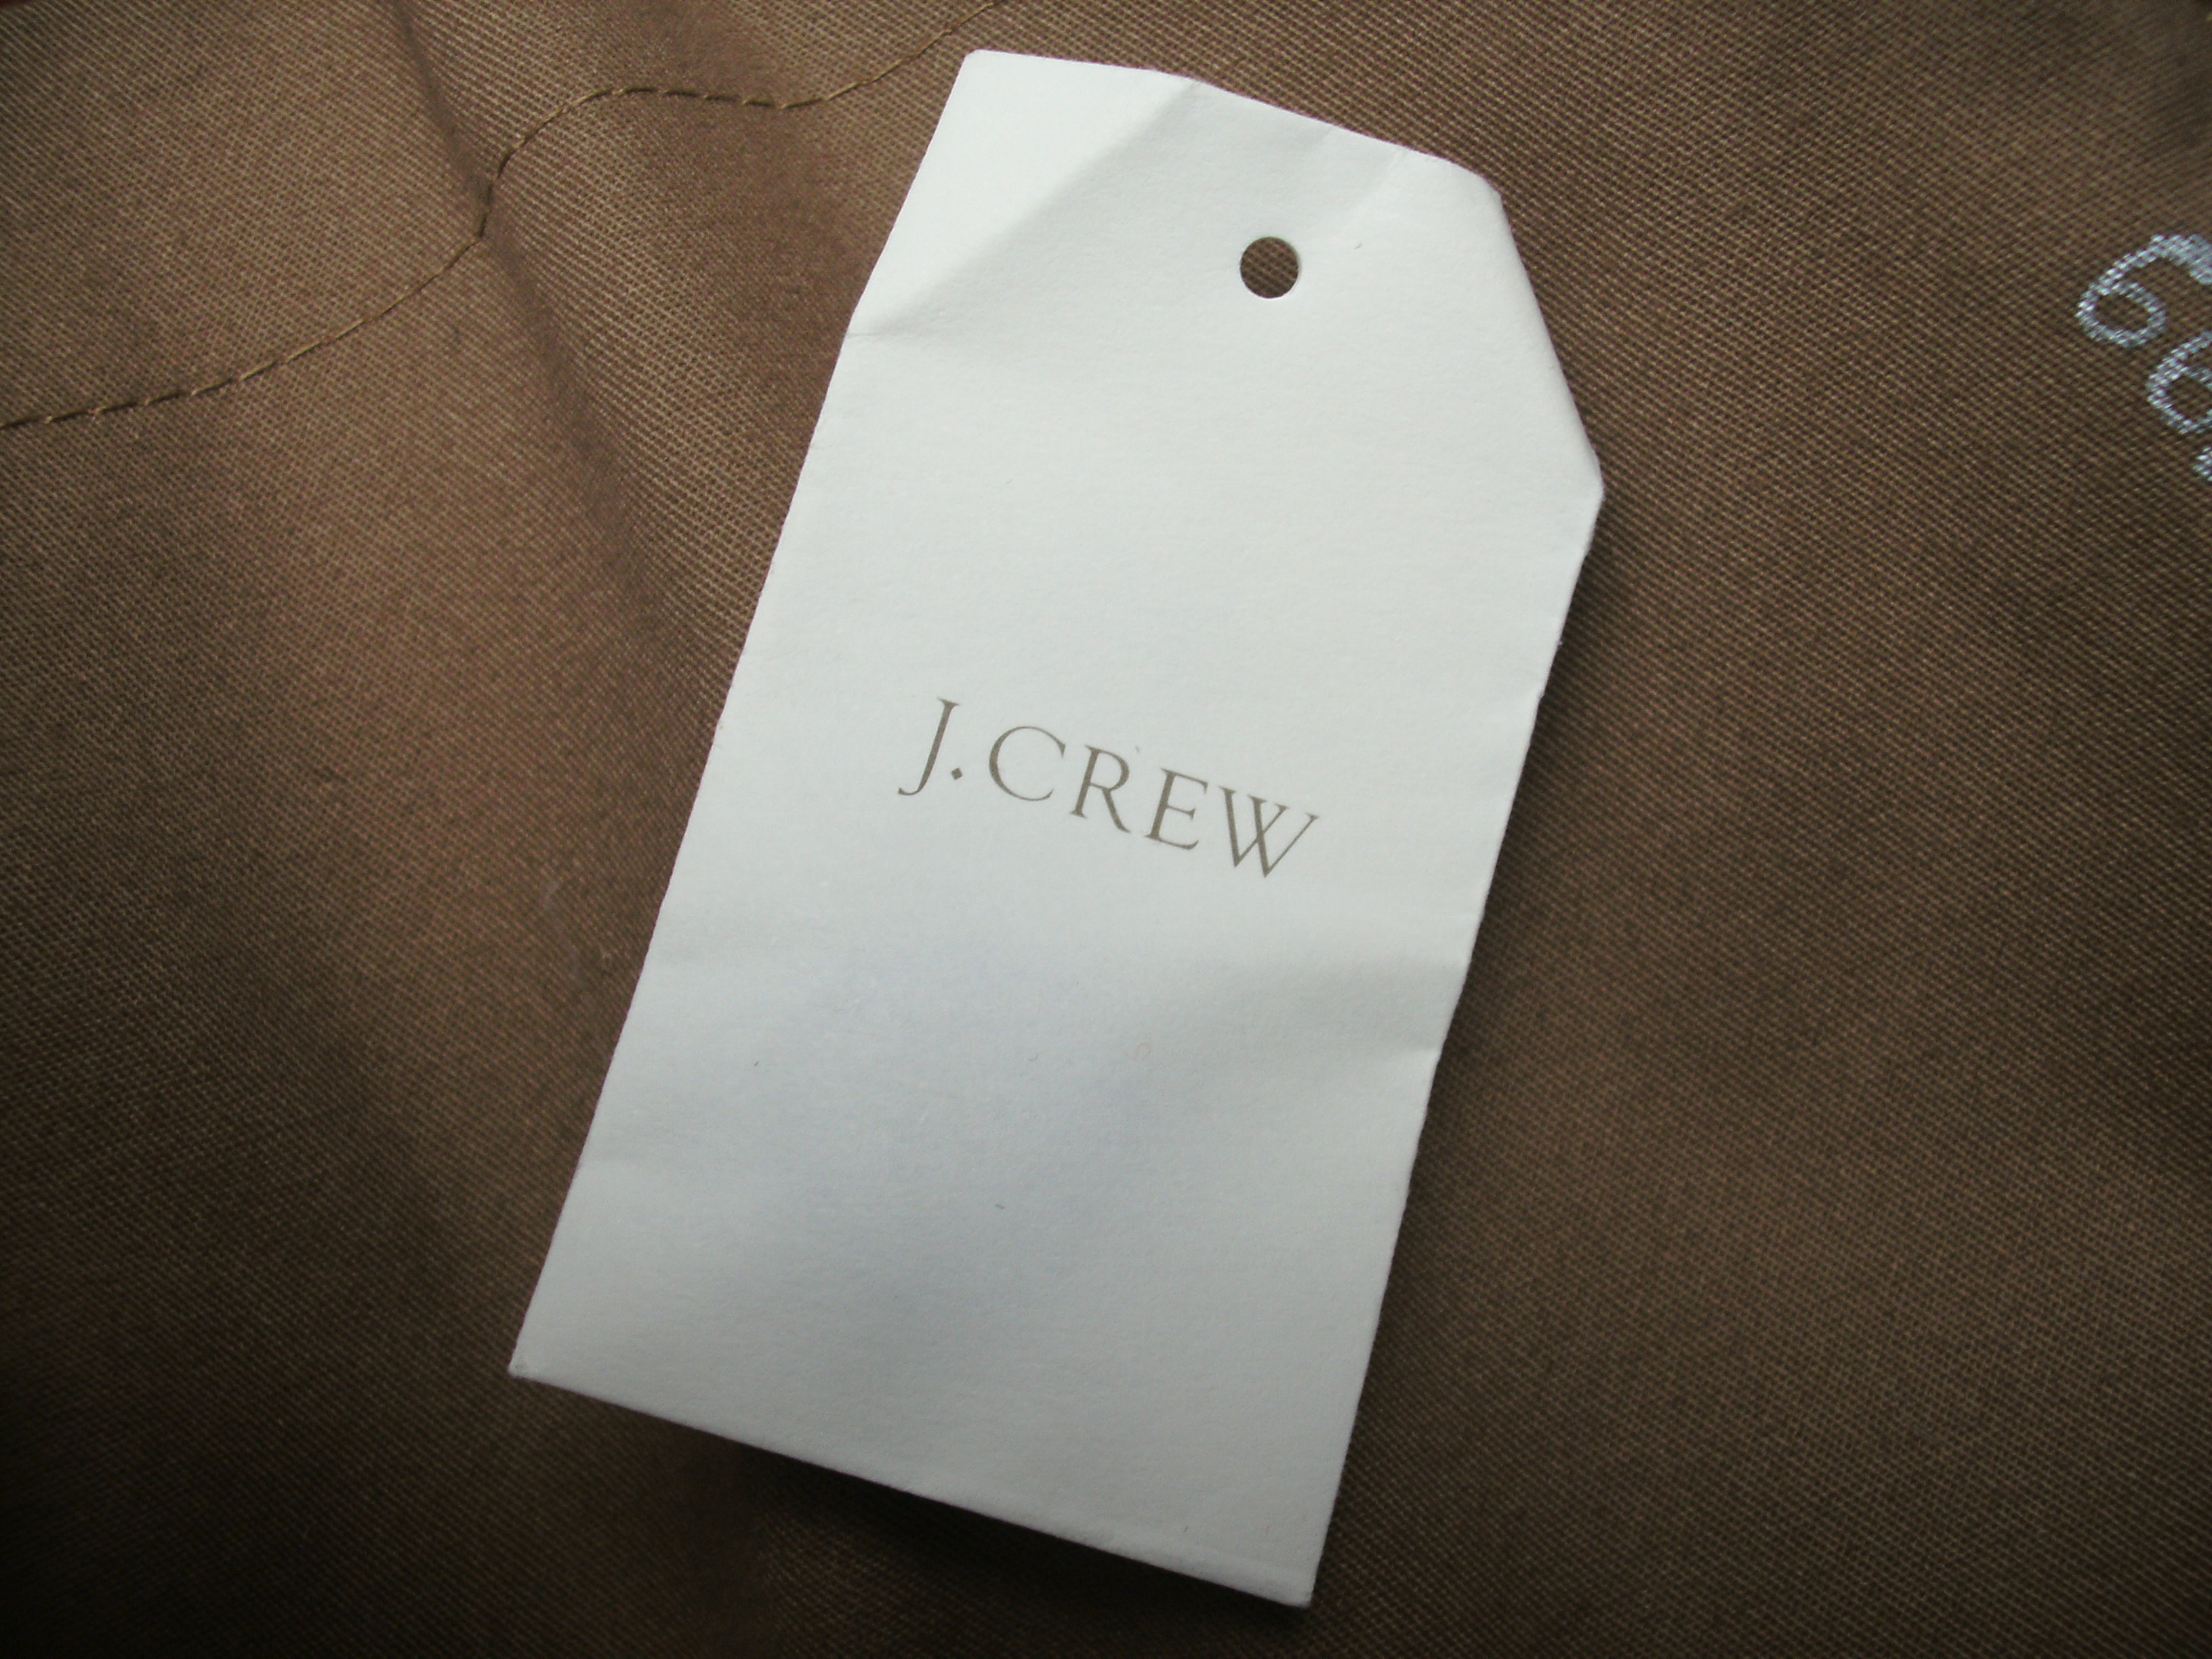 J Crew (9).JPG